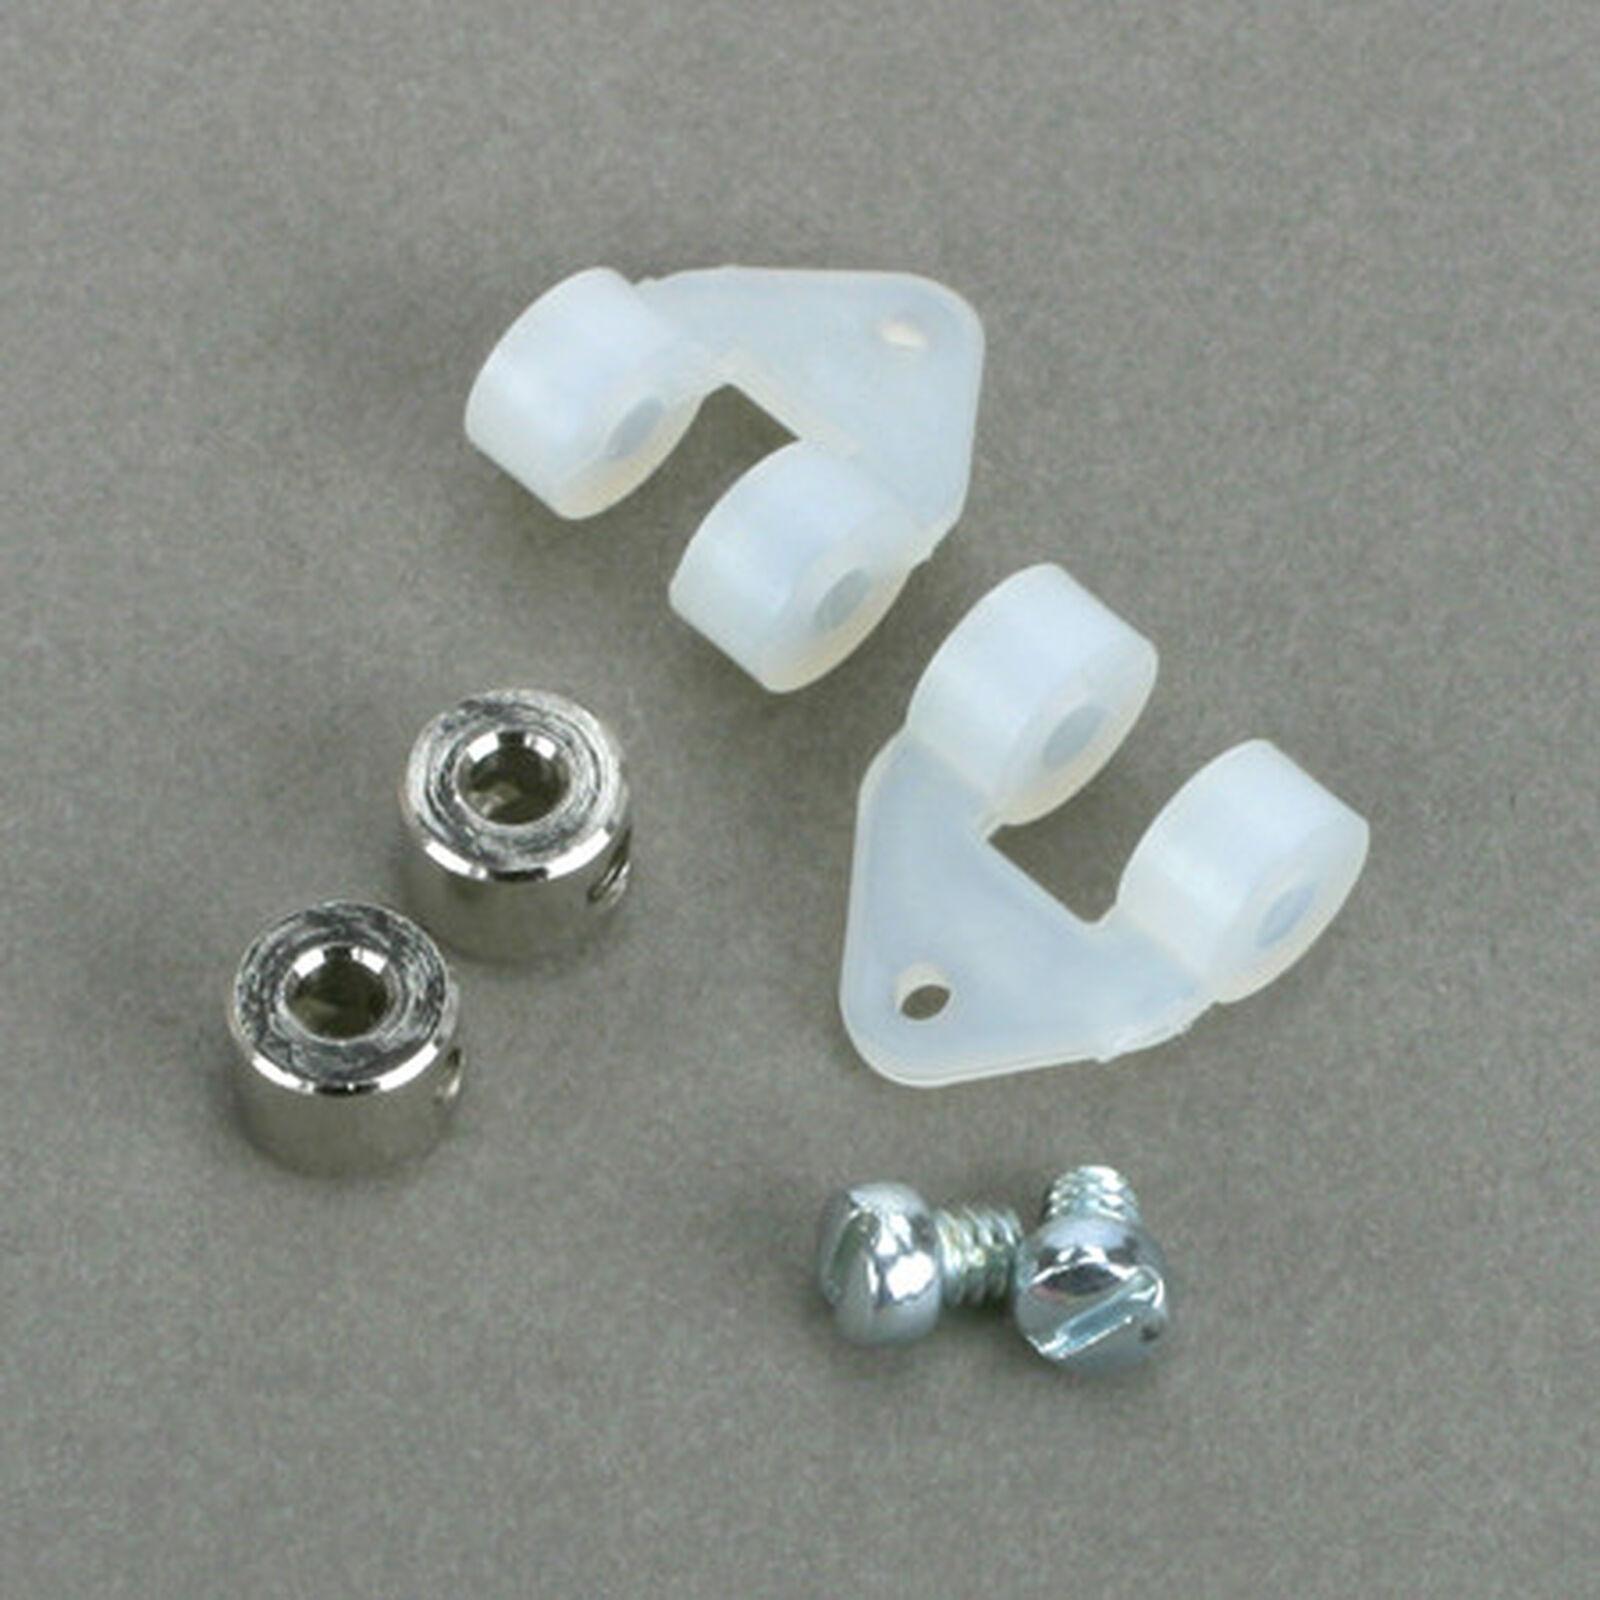 Strip Aileron Horn Connectors